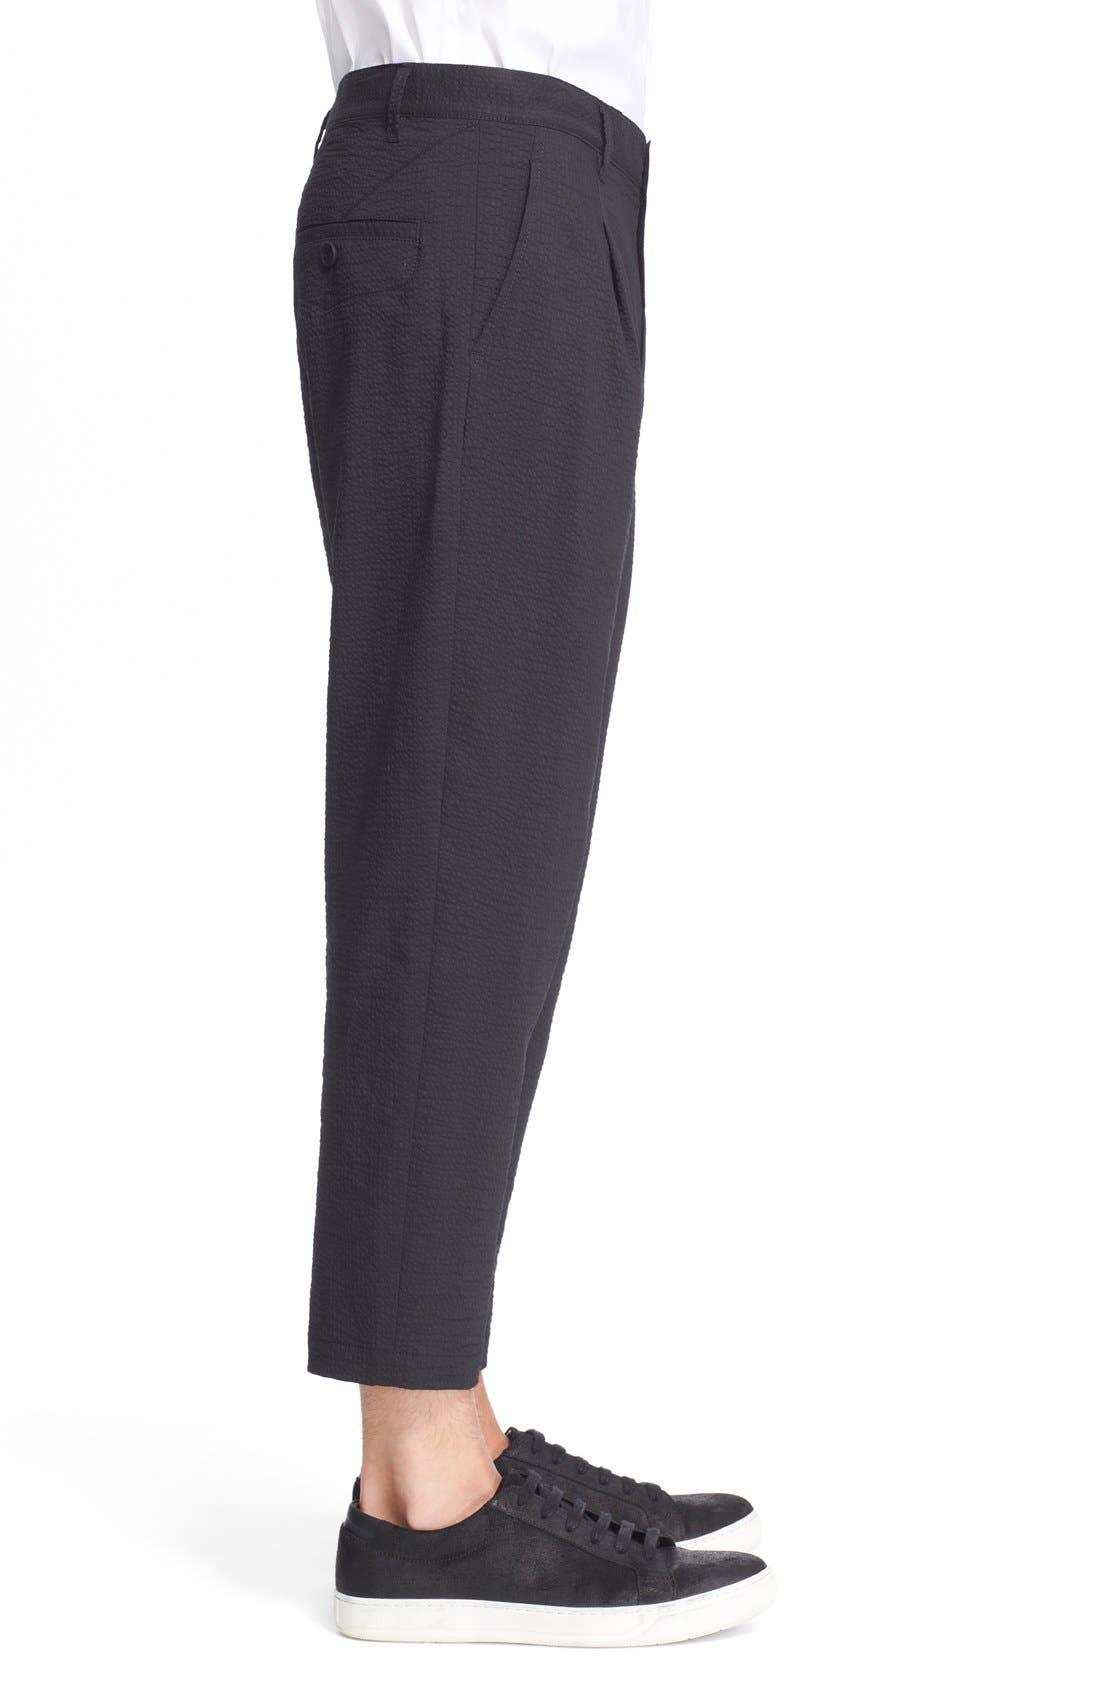 HELMUT LANG, Seersucker Trousers, Alternate thumbnail 4, color, 001